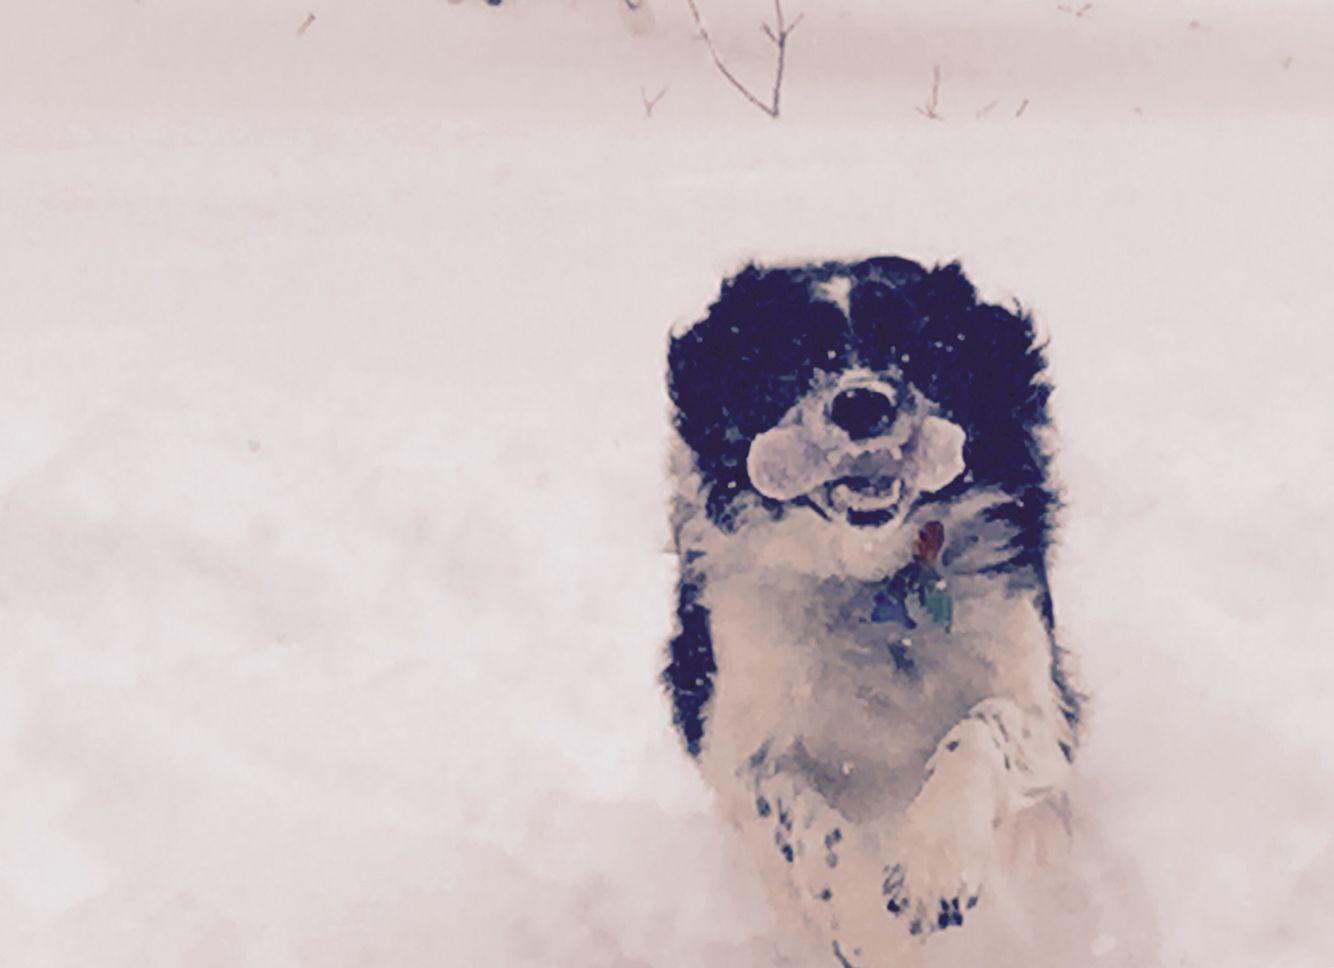 Feb 2015 playing fetch in snow Cedar rapids iowa, Niagra